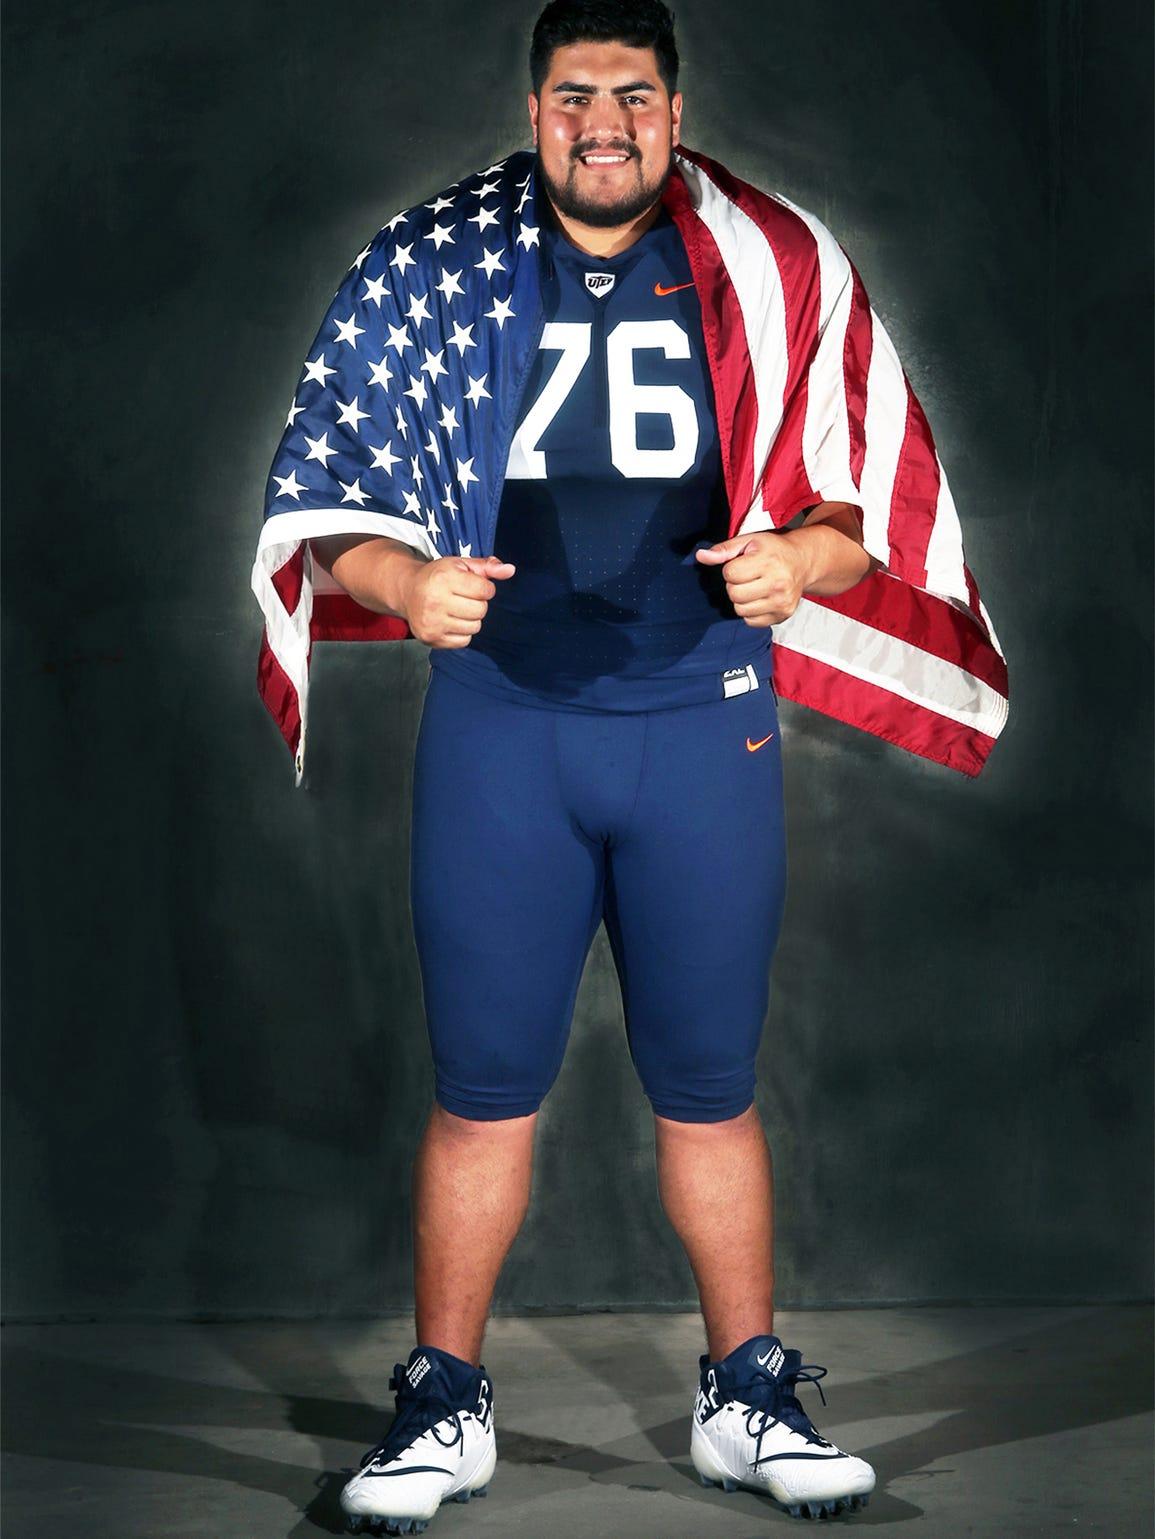 UTEP lineman Will Hernandez, an All-American Third